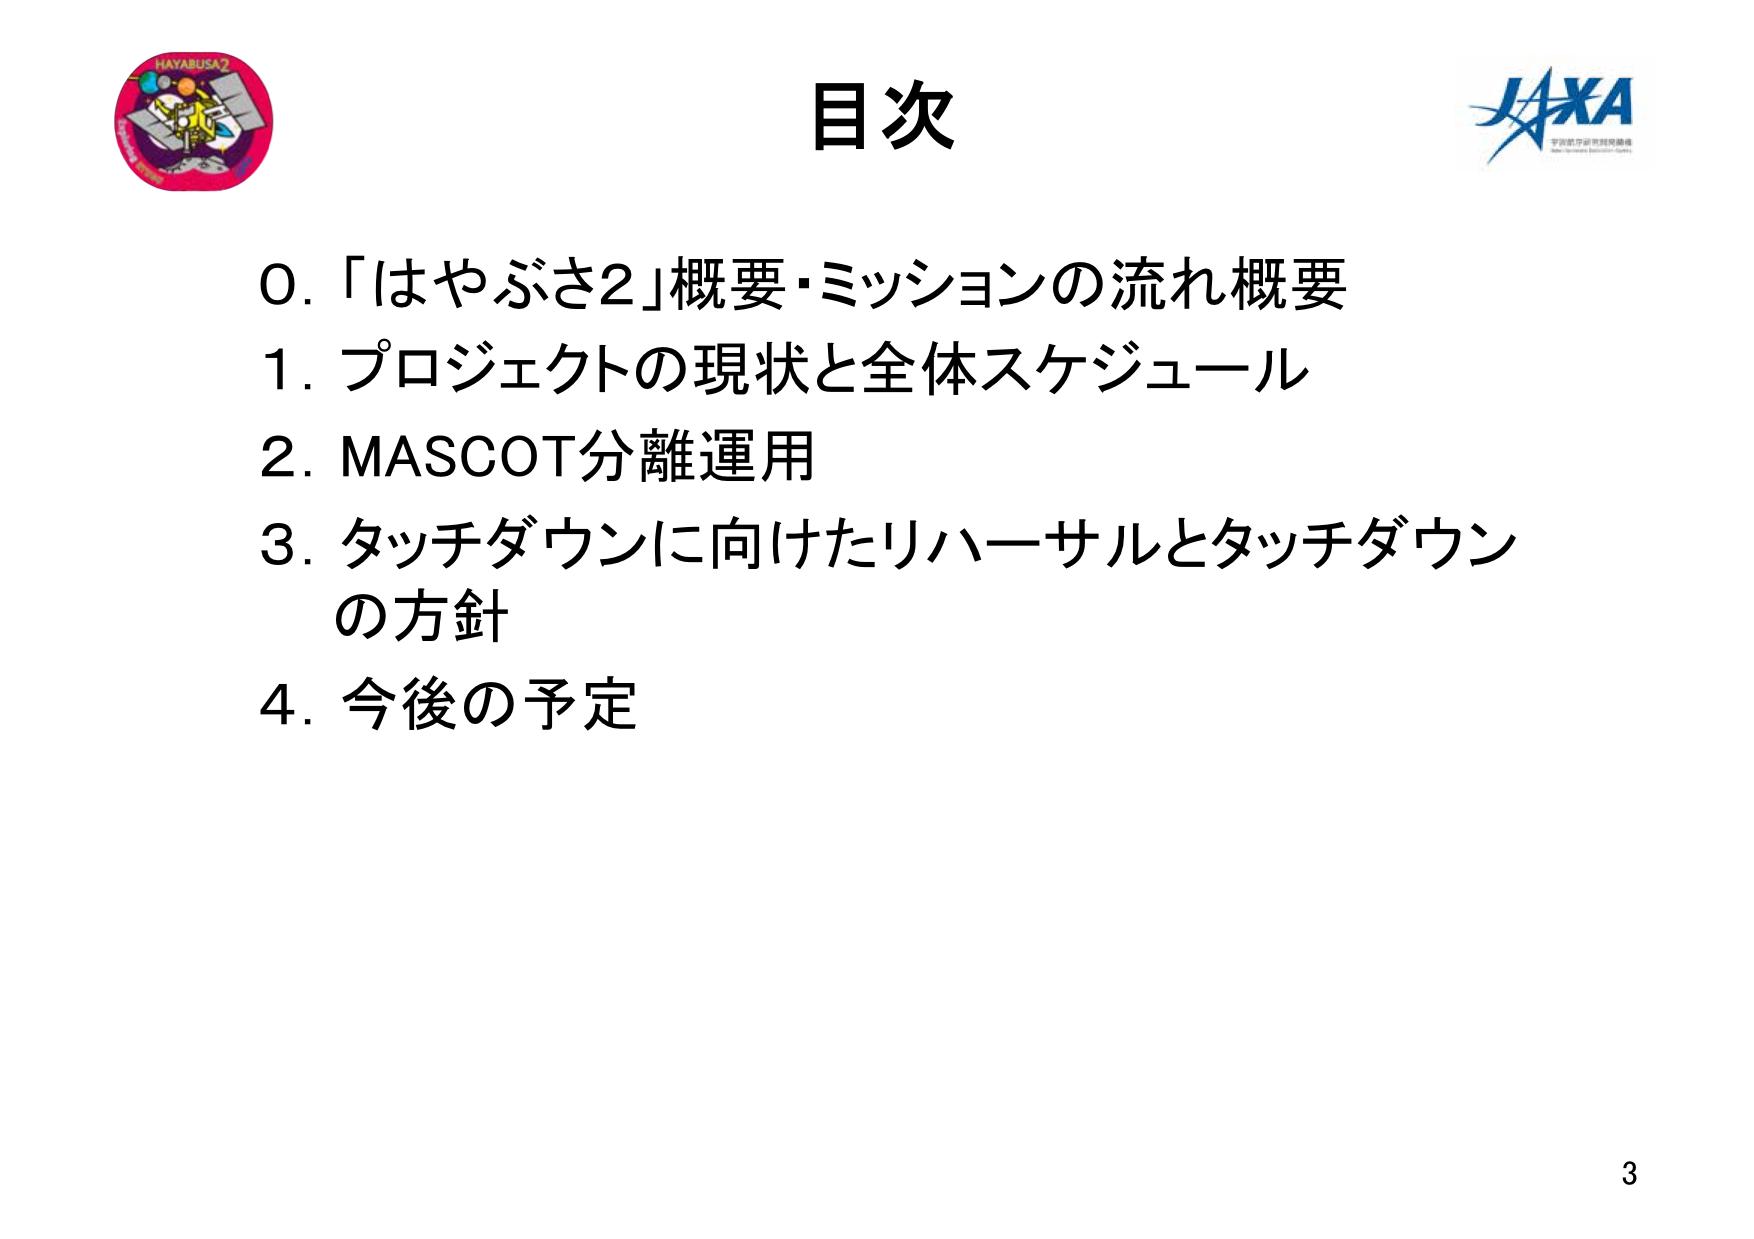 f:id:Imamura:20181011153942p:plain